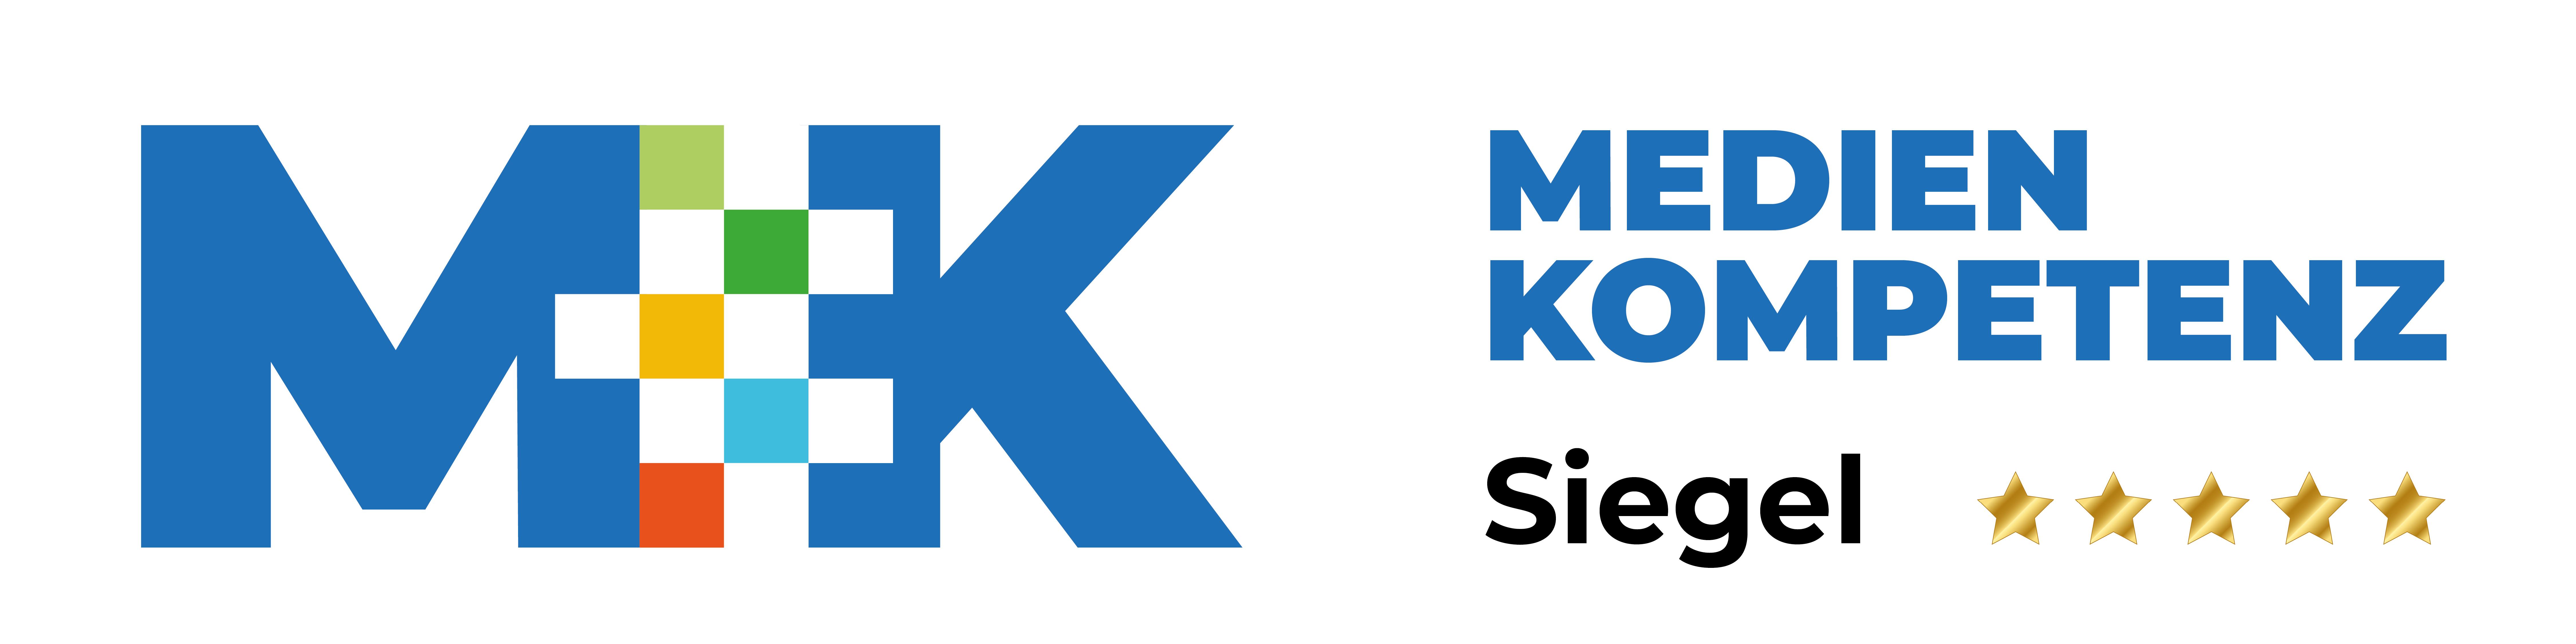 medienkompetenz-siegel.de